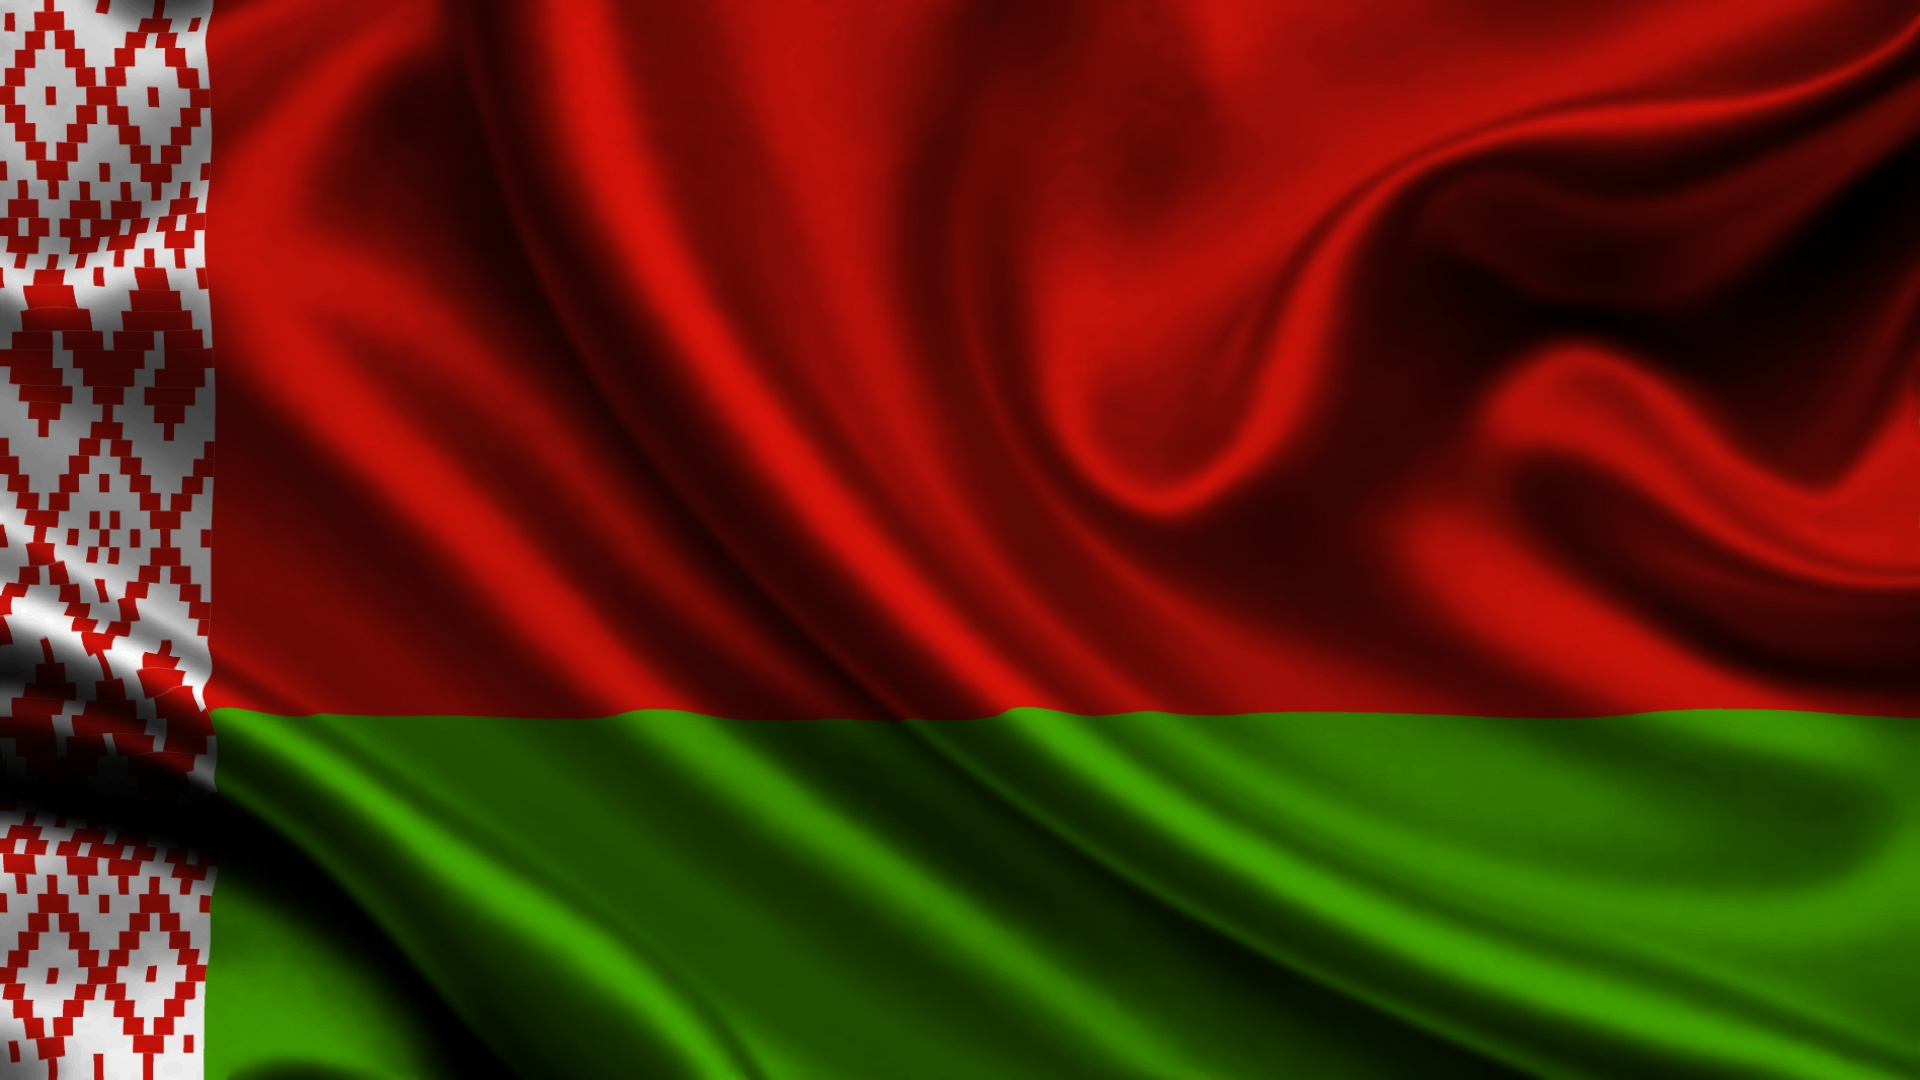 belarus flag wallpaper hd 52169